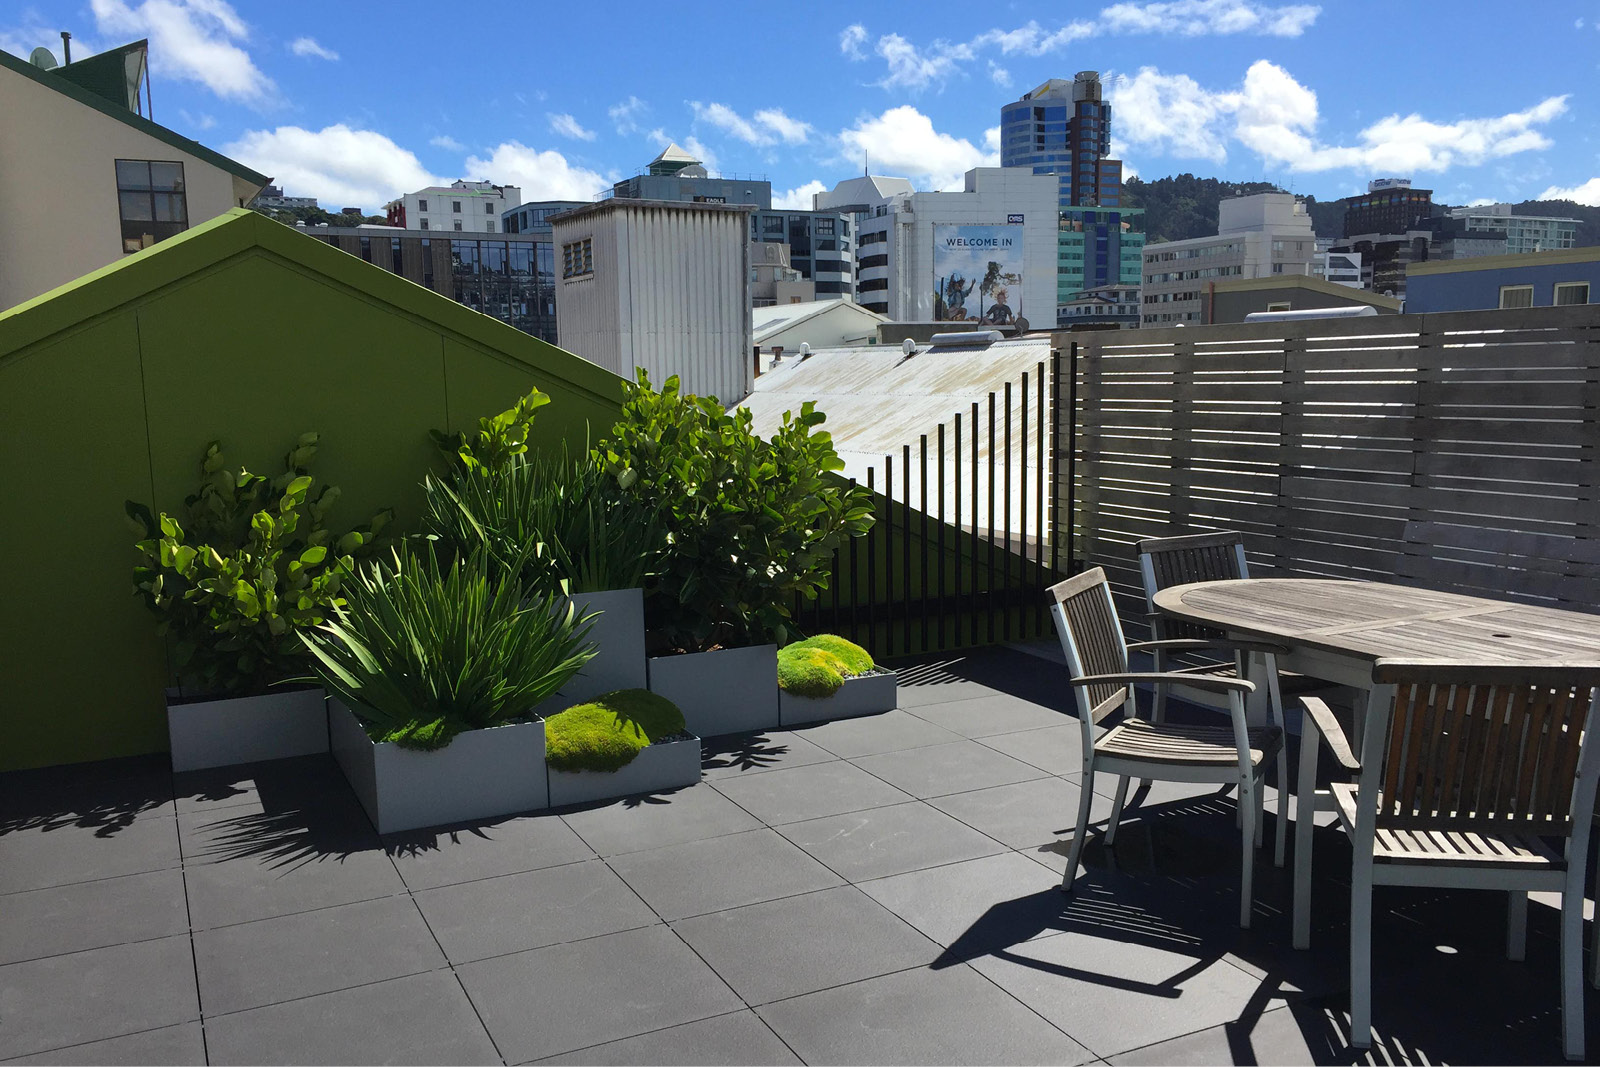 Rooftop_garden_City_courtyard.jpg